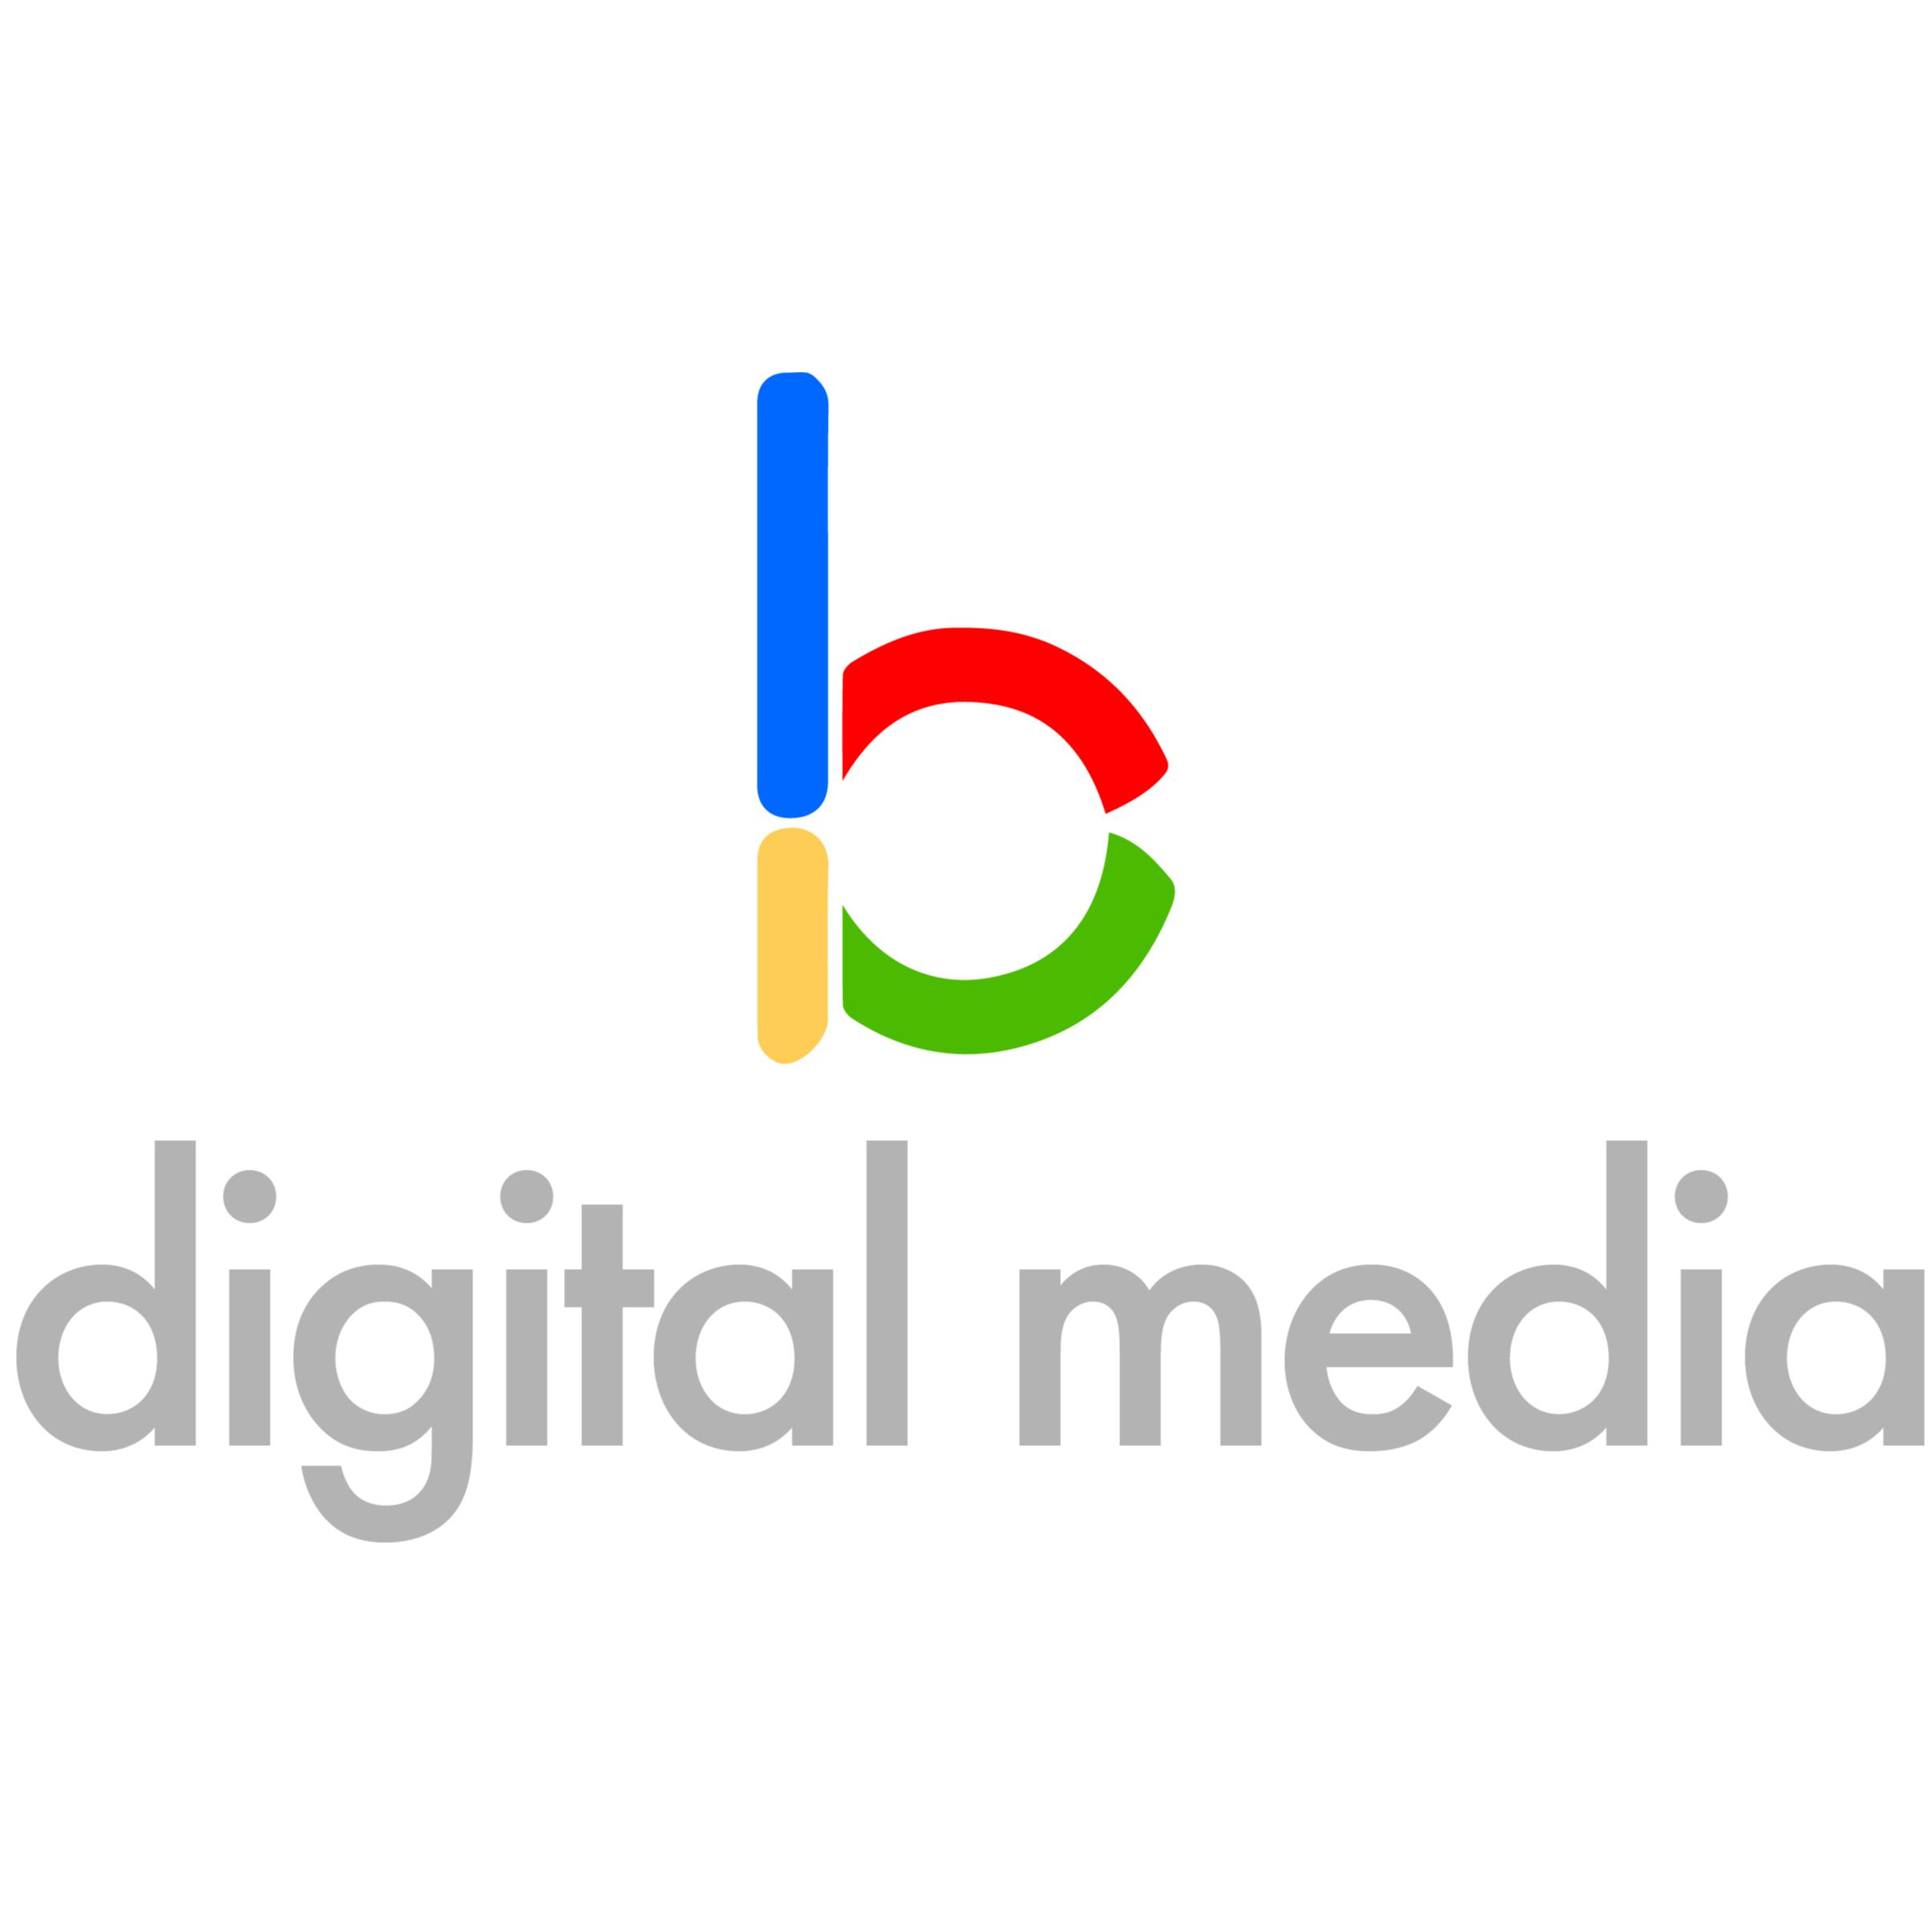 Bild zu Brand Digital Media GbR in Berlin